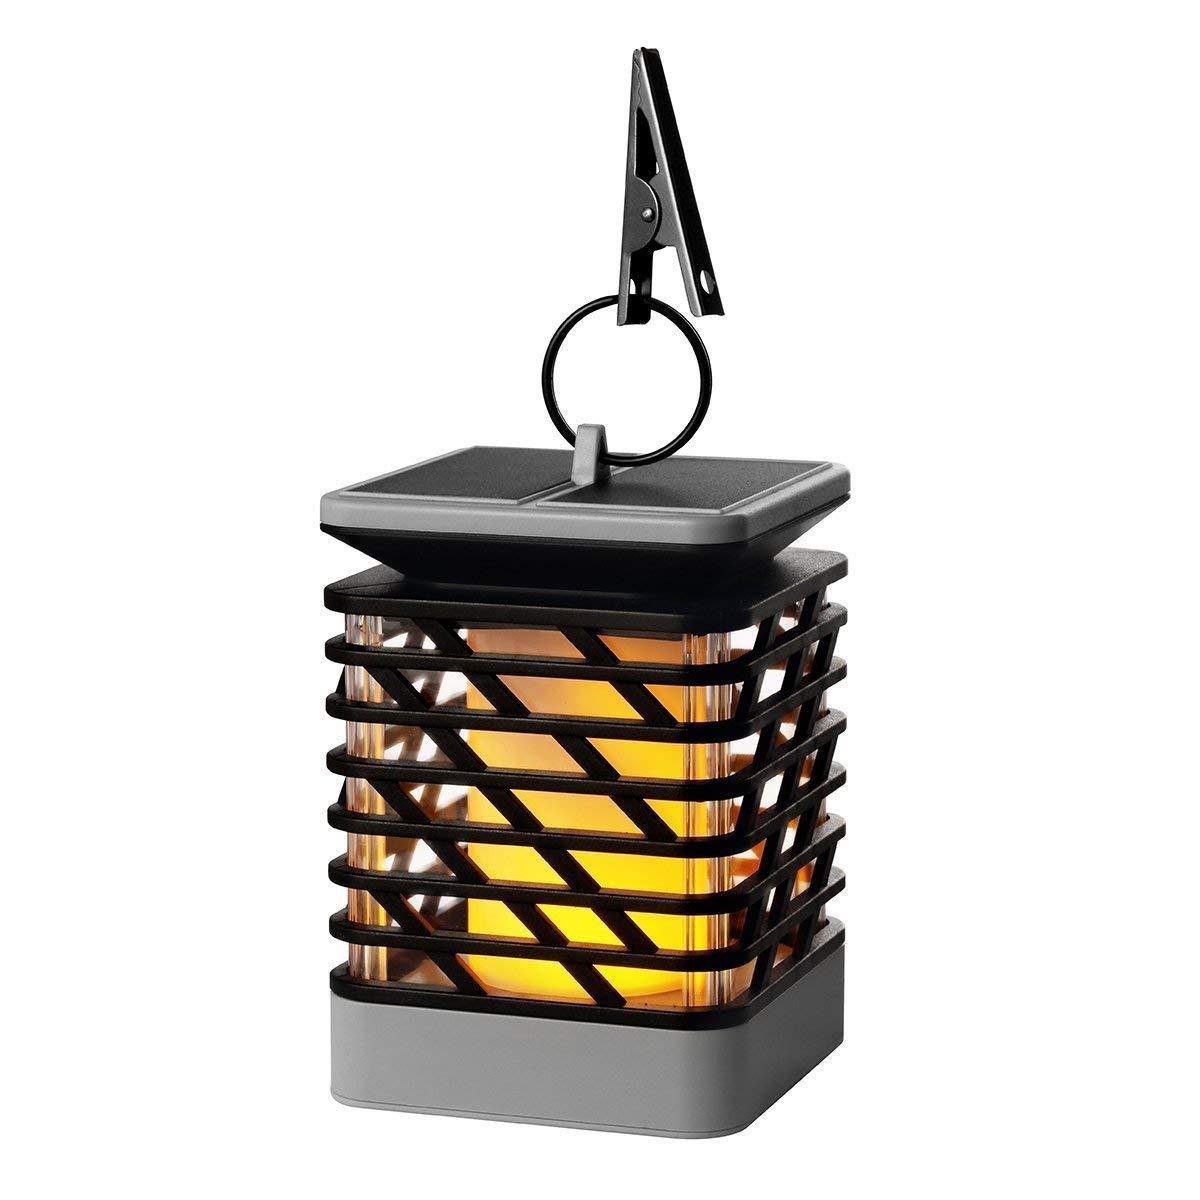 LED Solar Light Dance Light Flame Outdoor Chandelier Decorative Light Solar Waterproof Umbrella Lantern Night Light Automatic Sensor Garden Street Light Safety